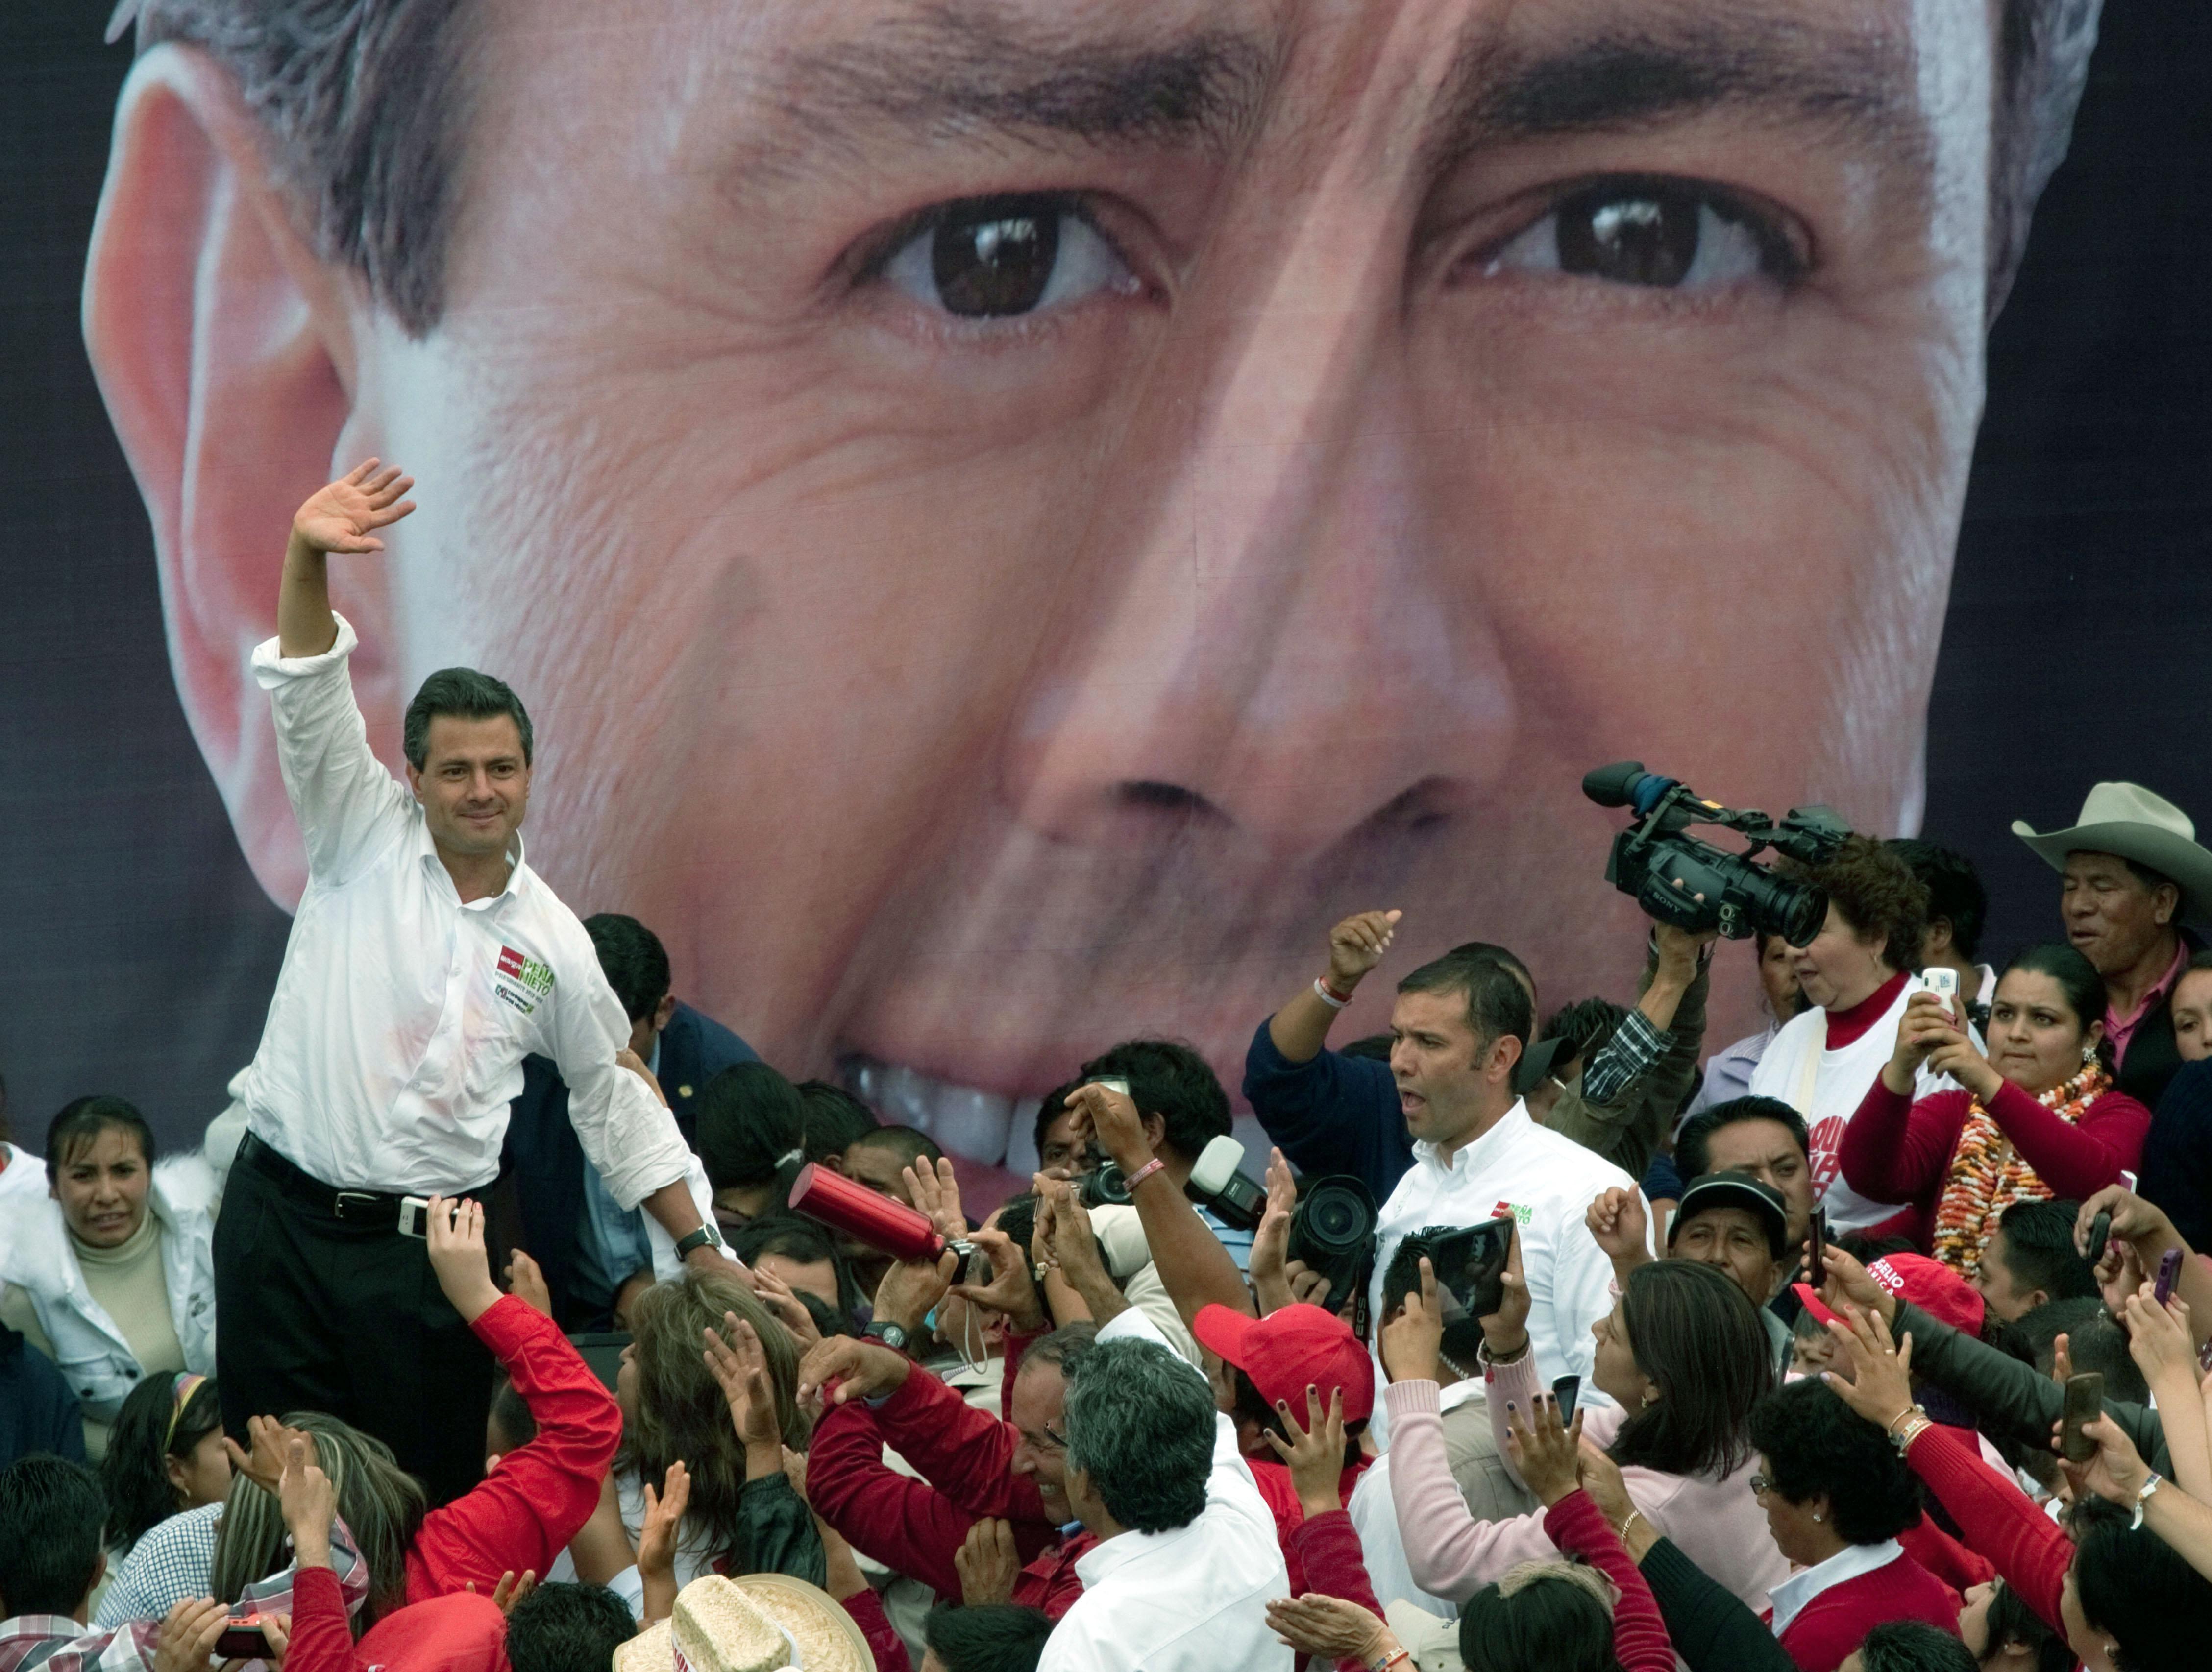 Enrique Peña Nieto, Mexican presidential candidate for the PRI